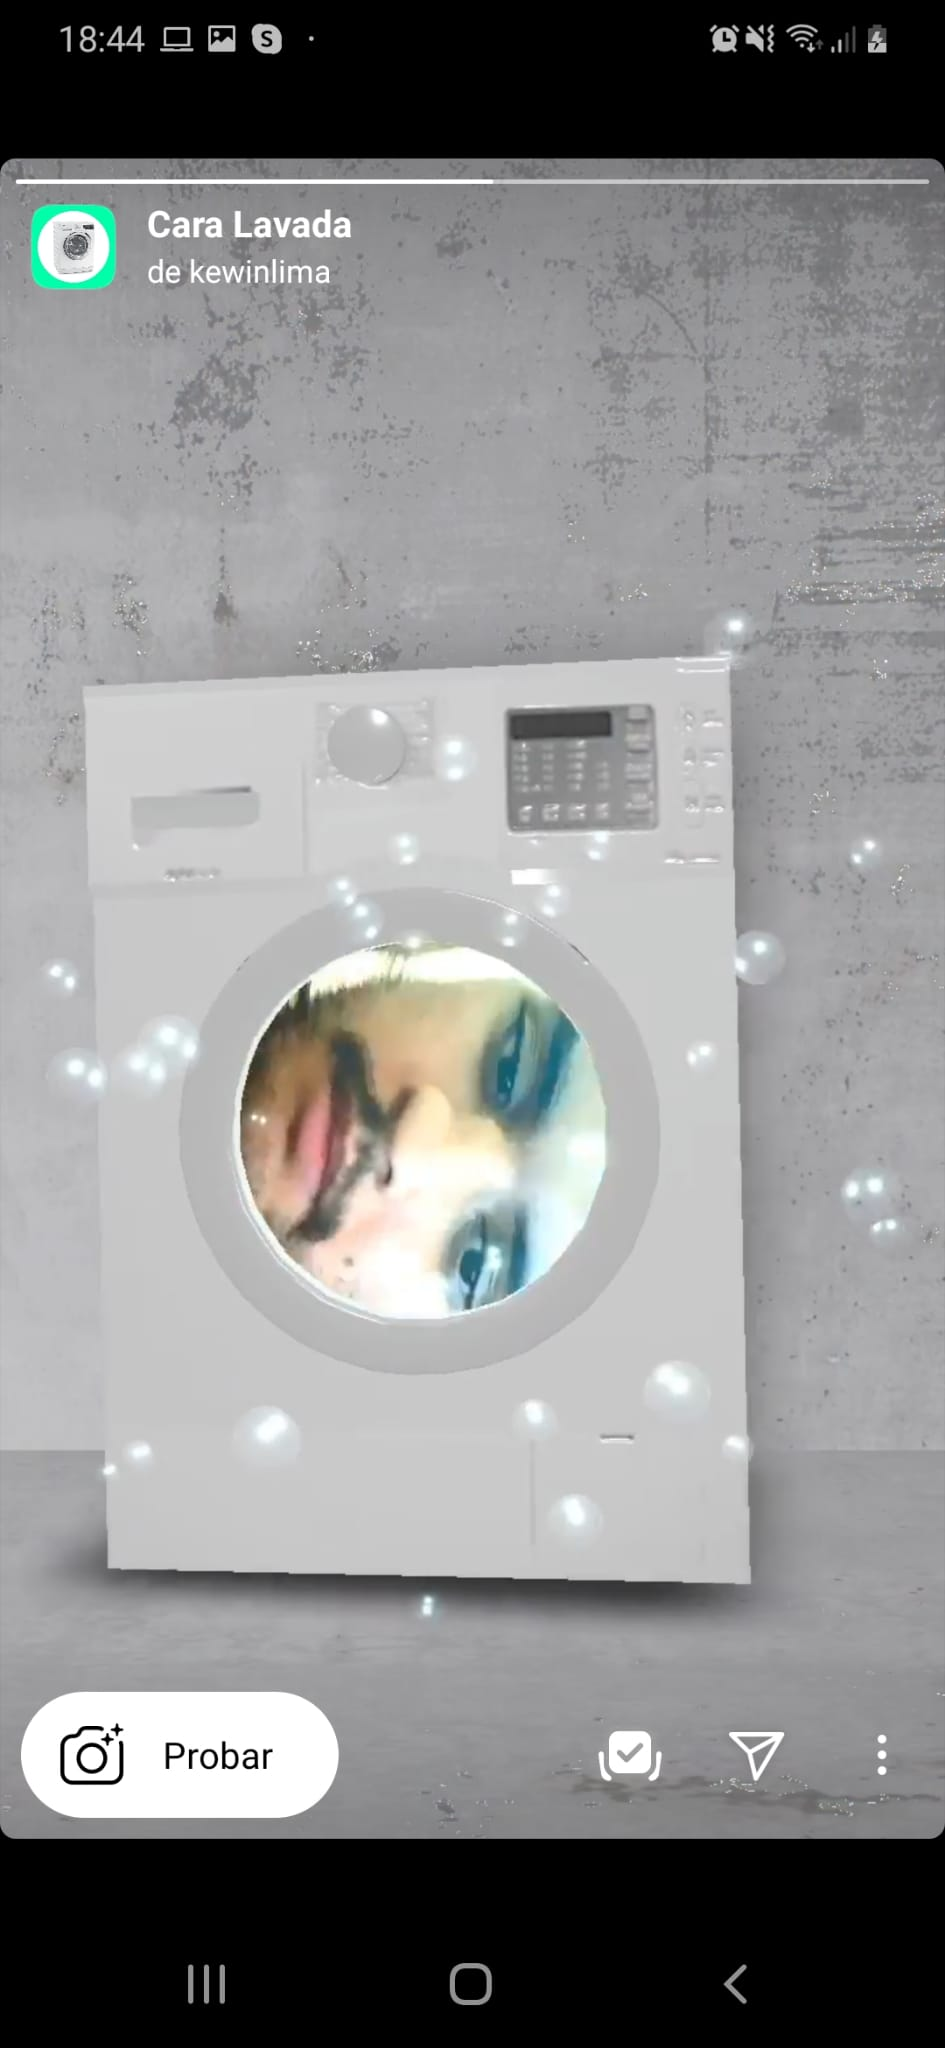 Cara Lavada